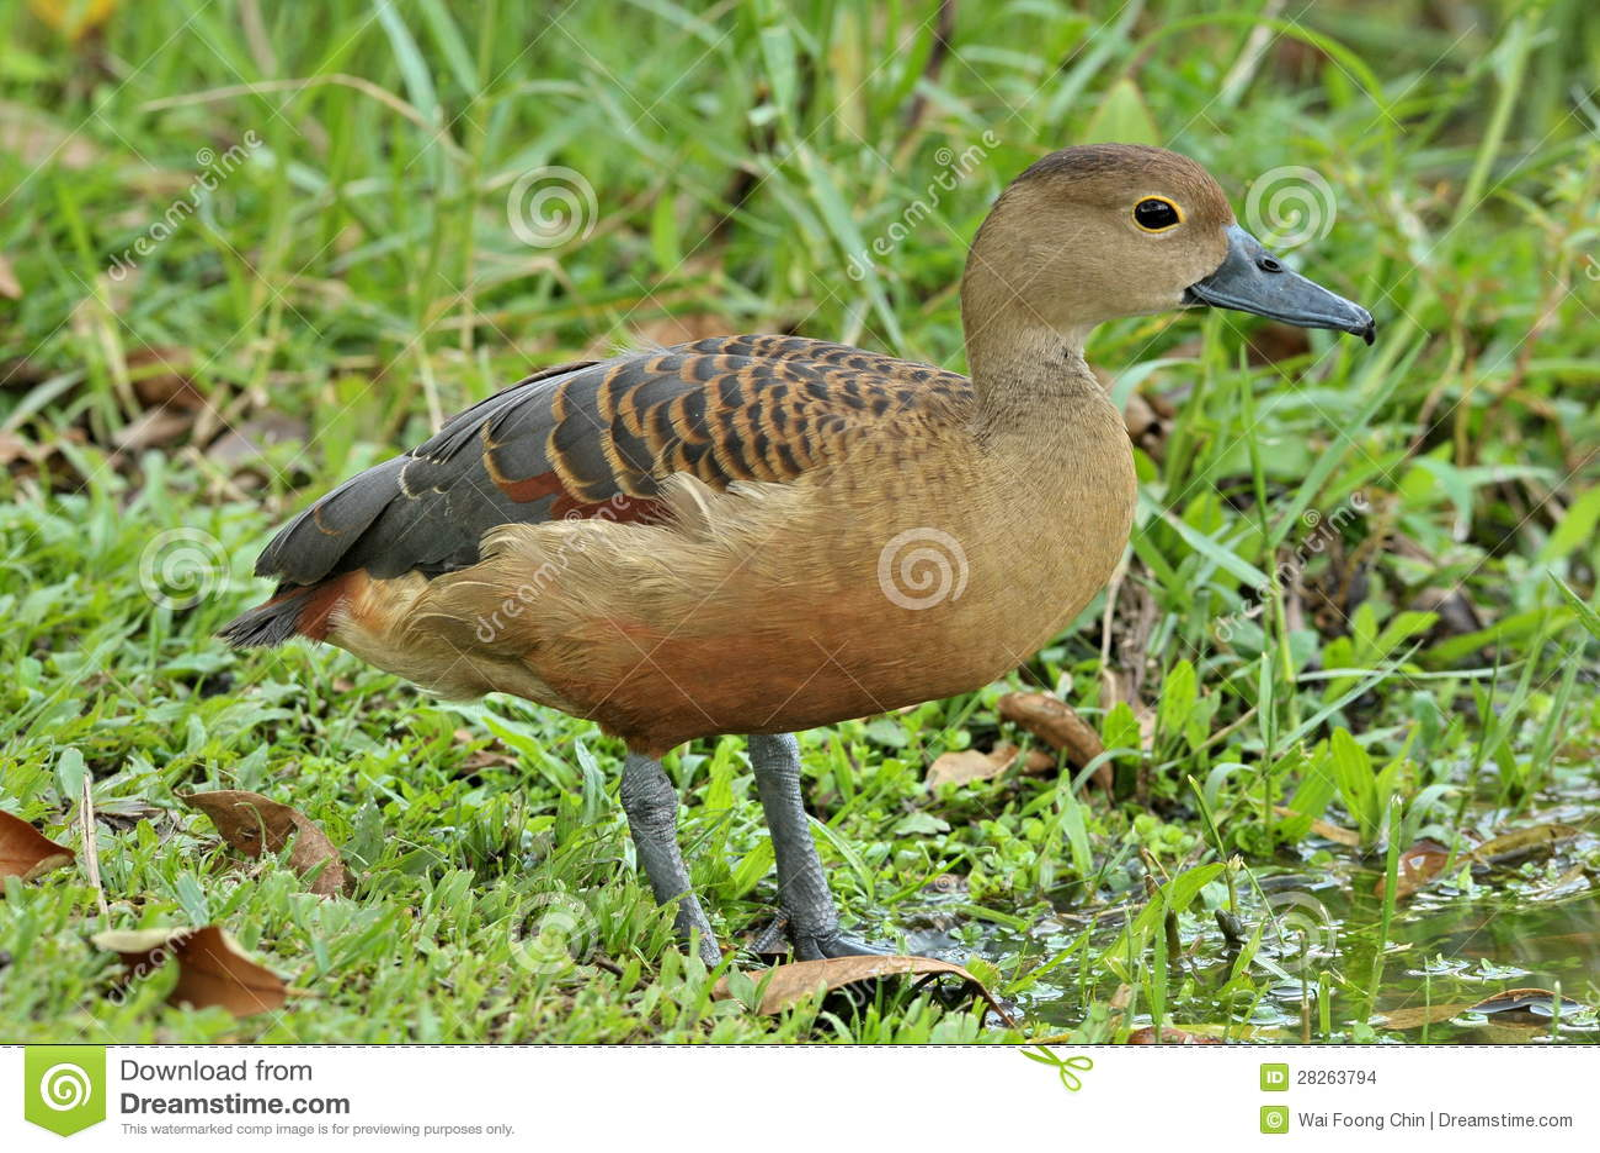 Lesser whistling duck - photo#27